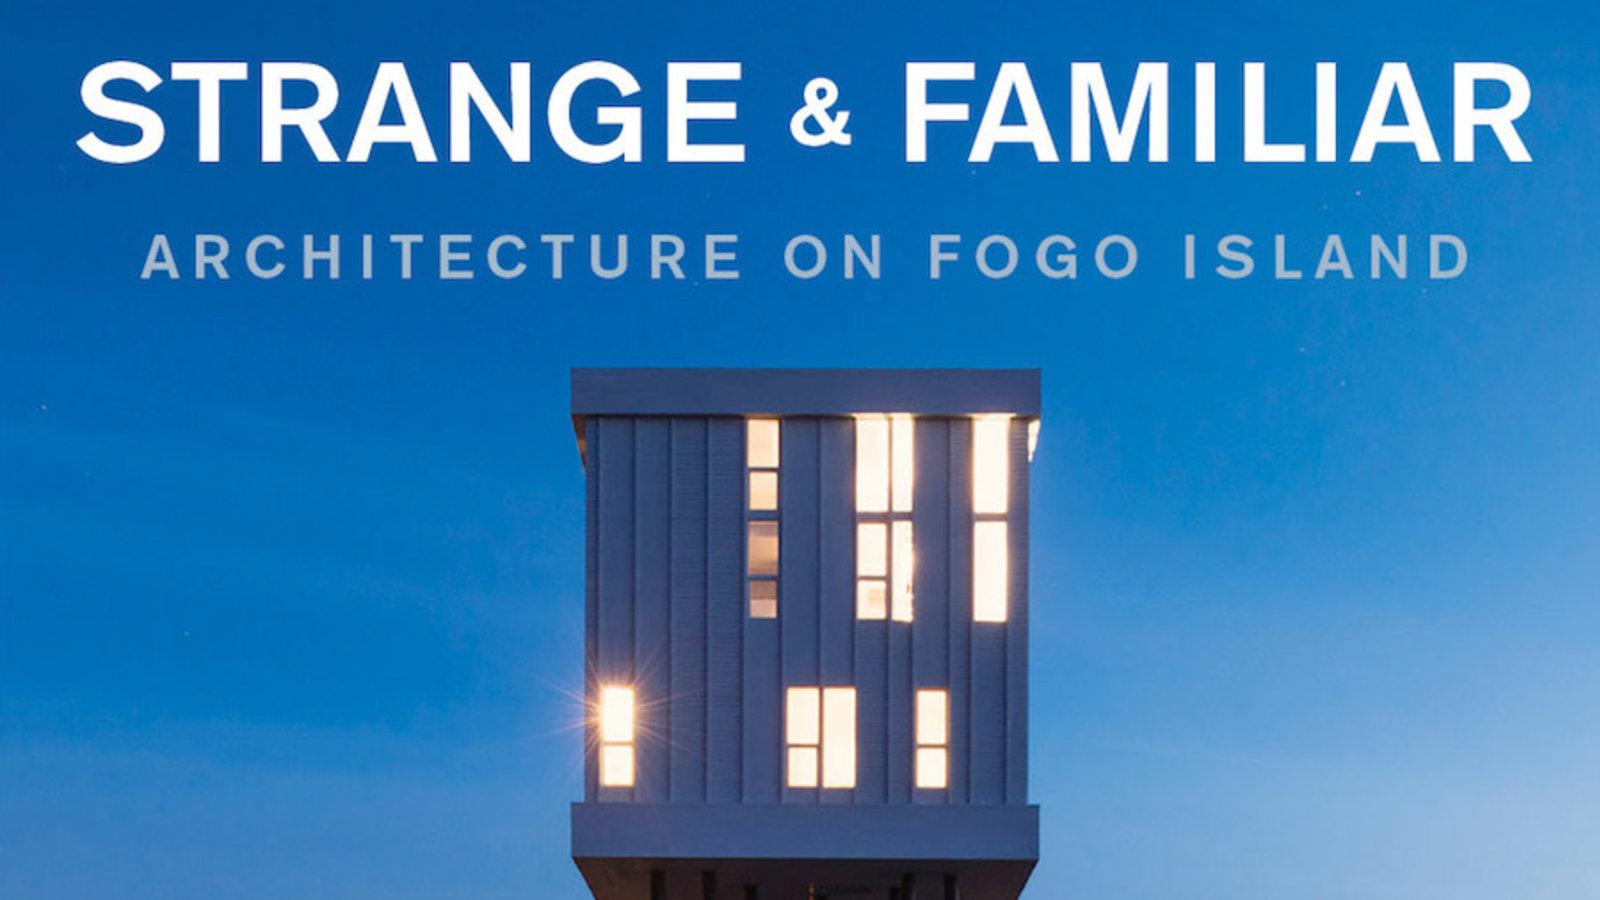 Strange and Familiar: Architecture on Fogo Island